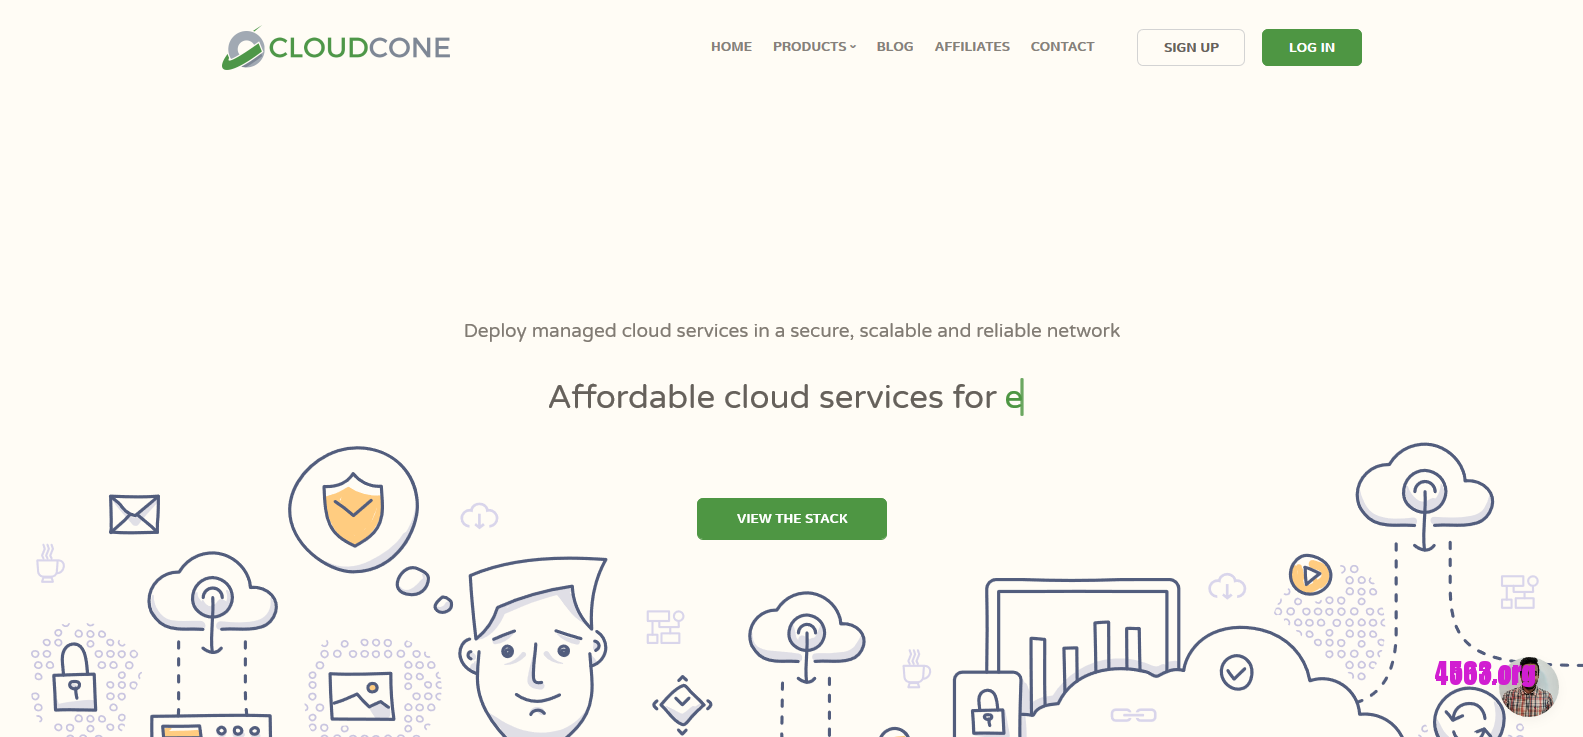 CloudCone 限時特惠@256MB VPS@$1.49/月